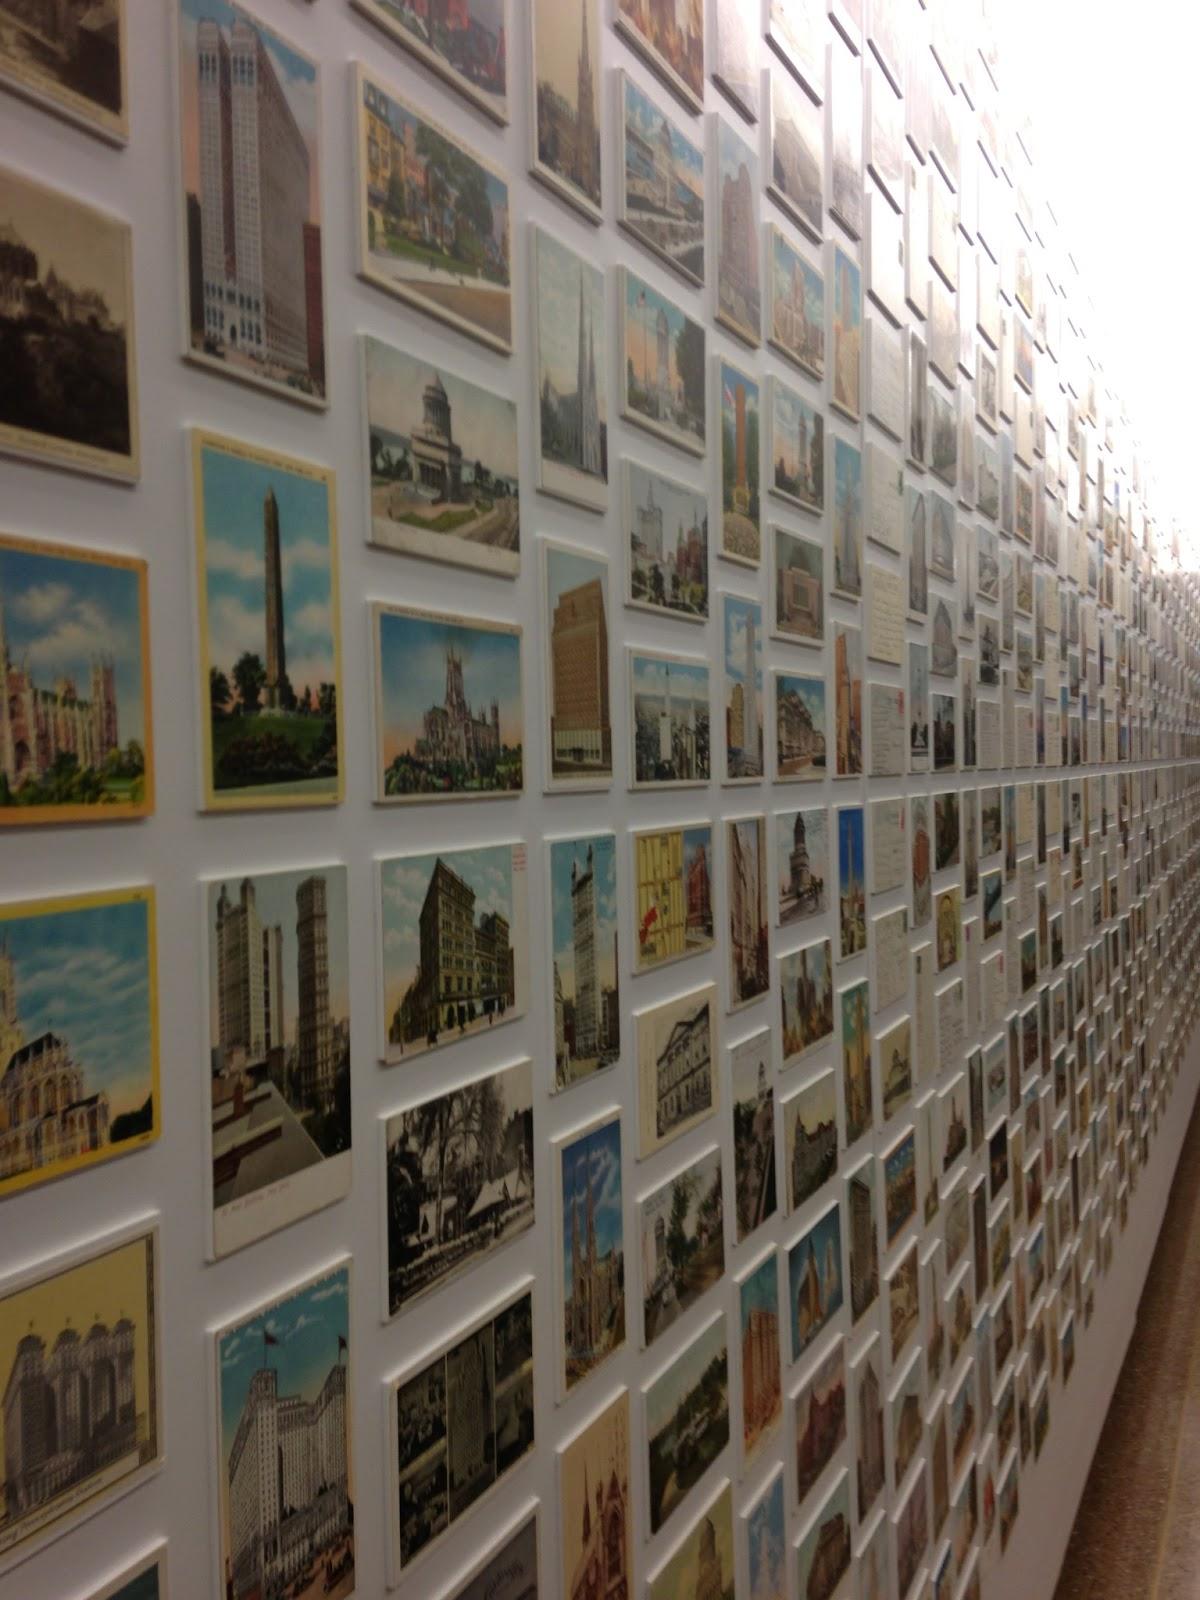 Postcard How To Build Global Community: CardCow Vintage Postcard Blog: Best Postcard Display Ever